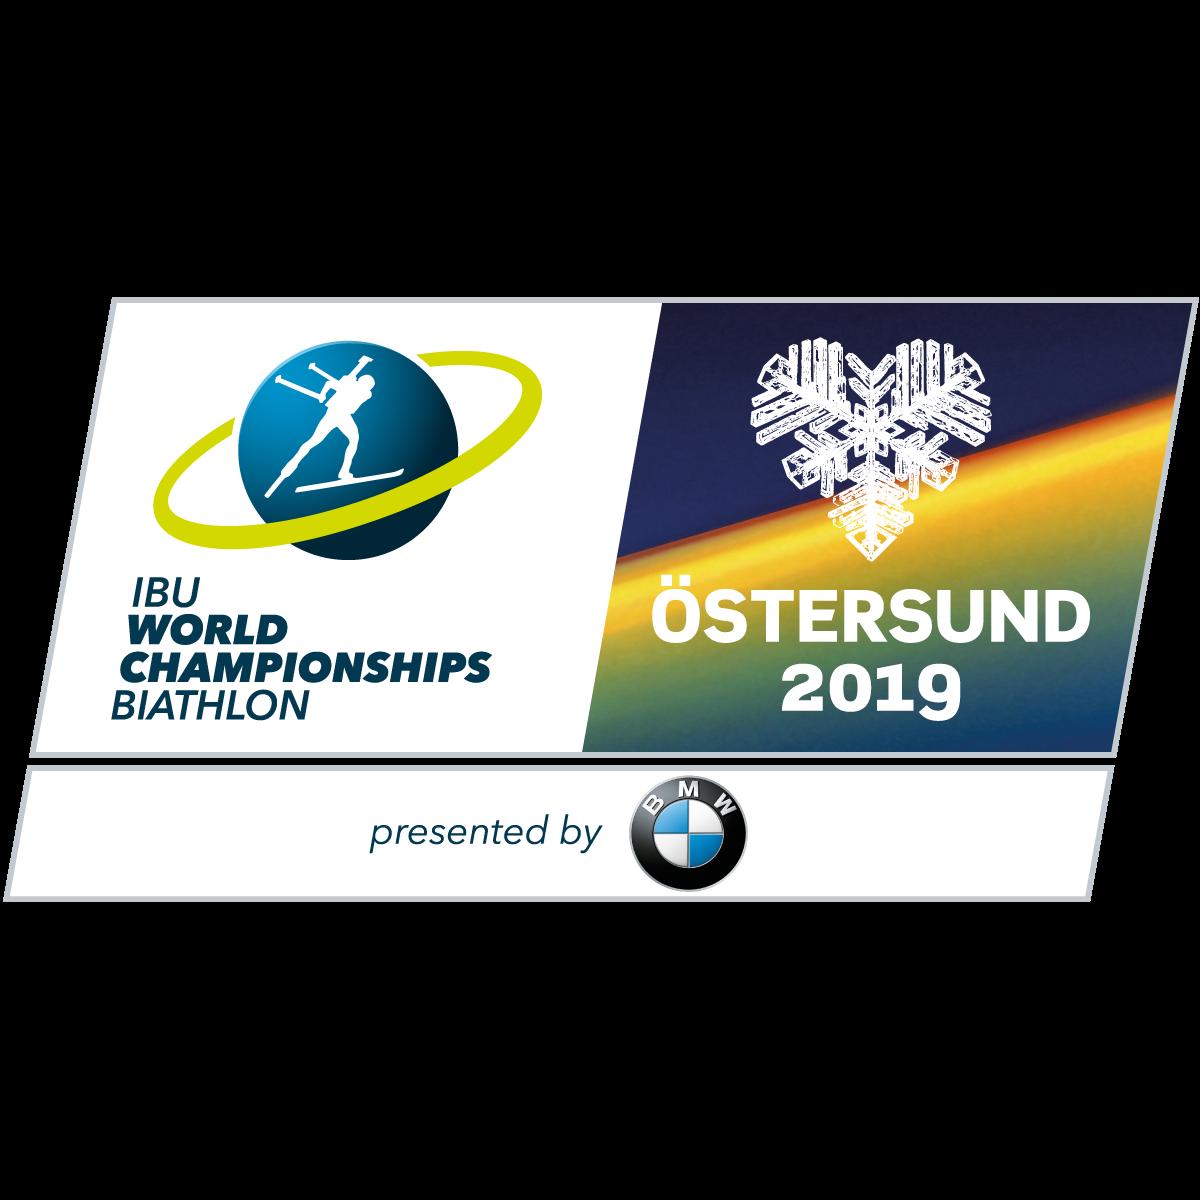 2019 Biathlon World Championships